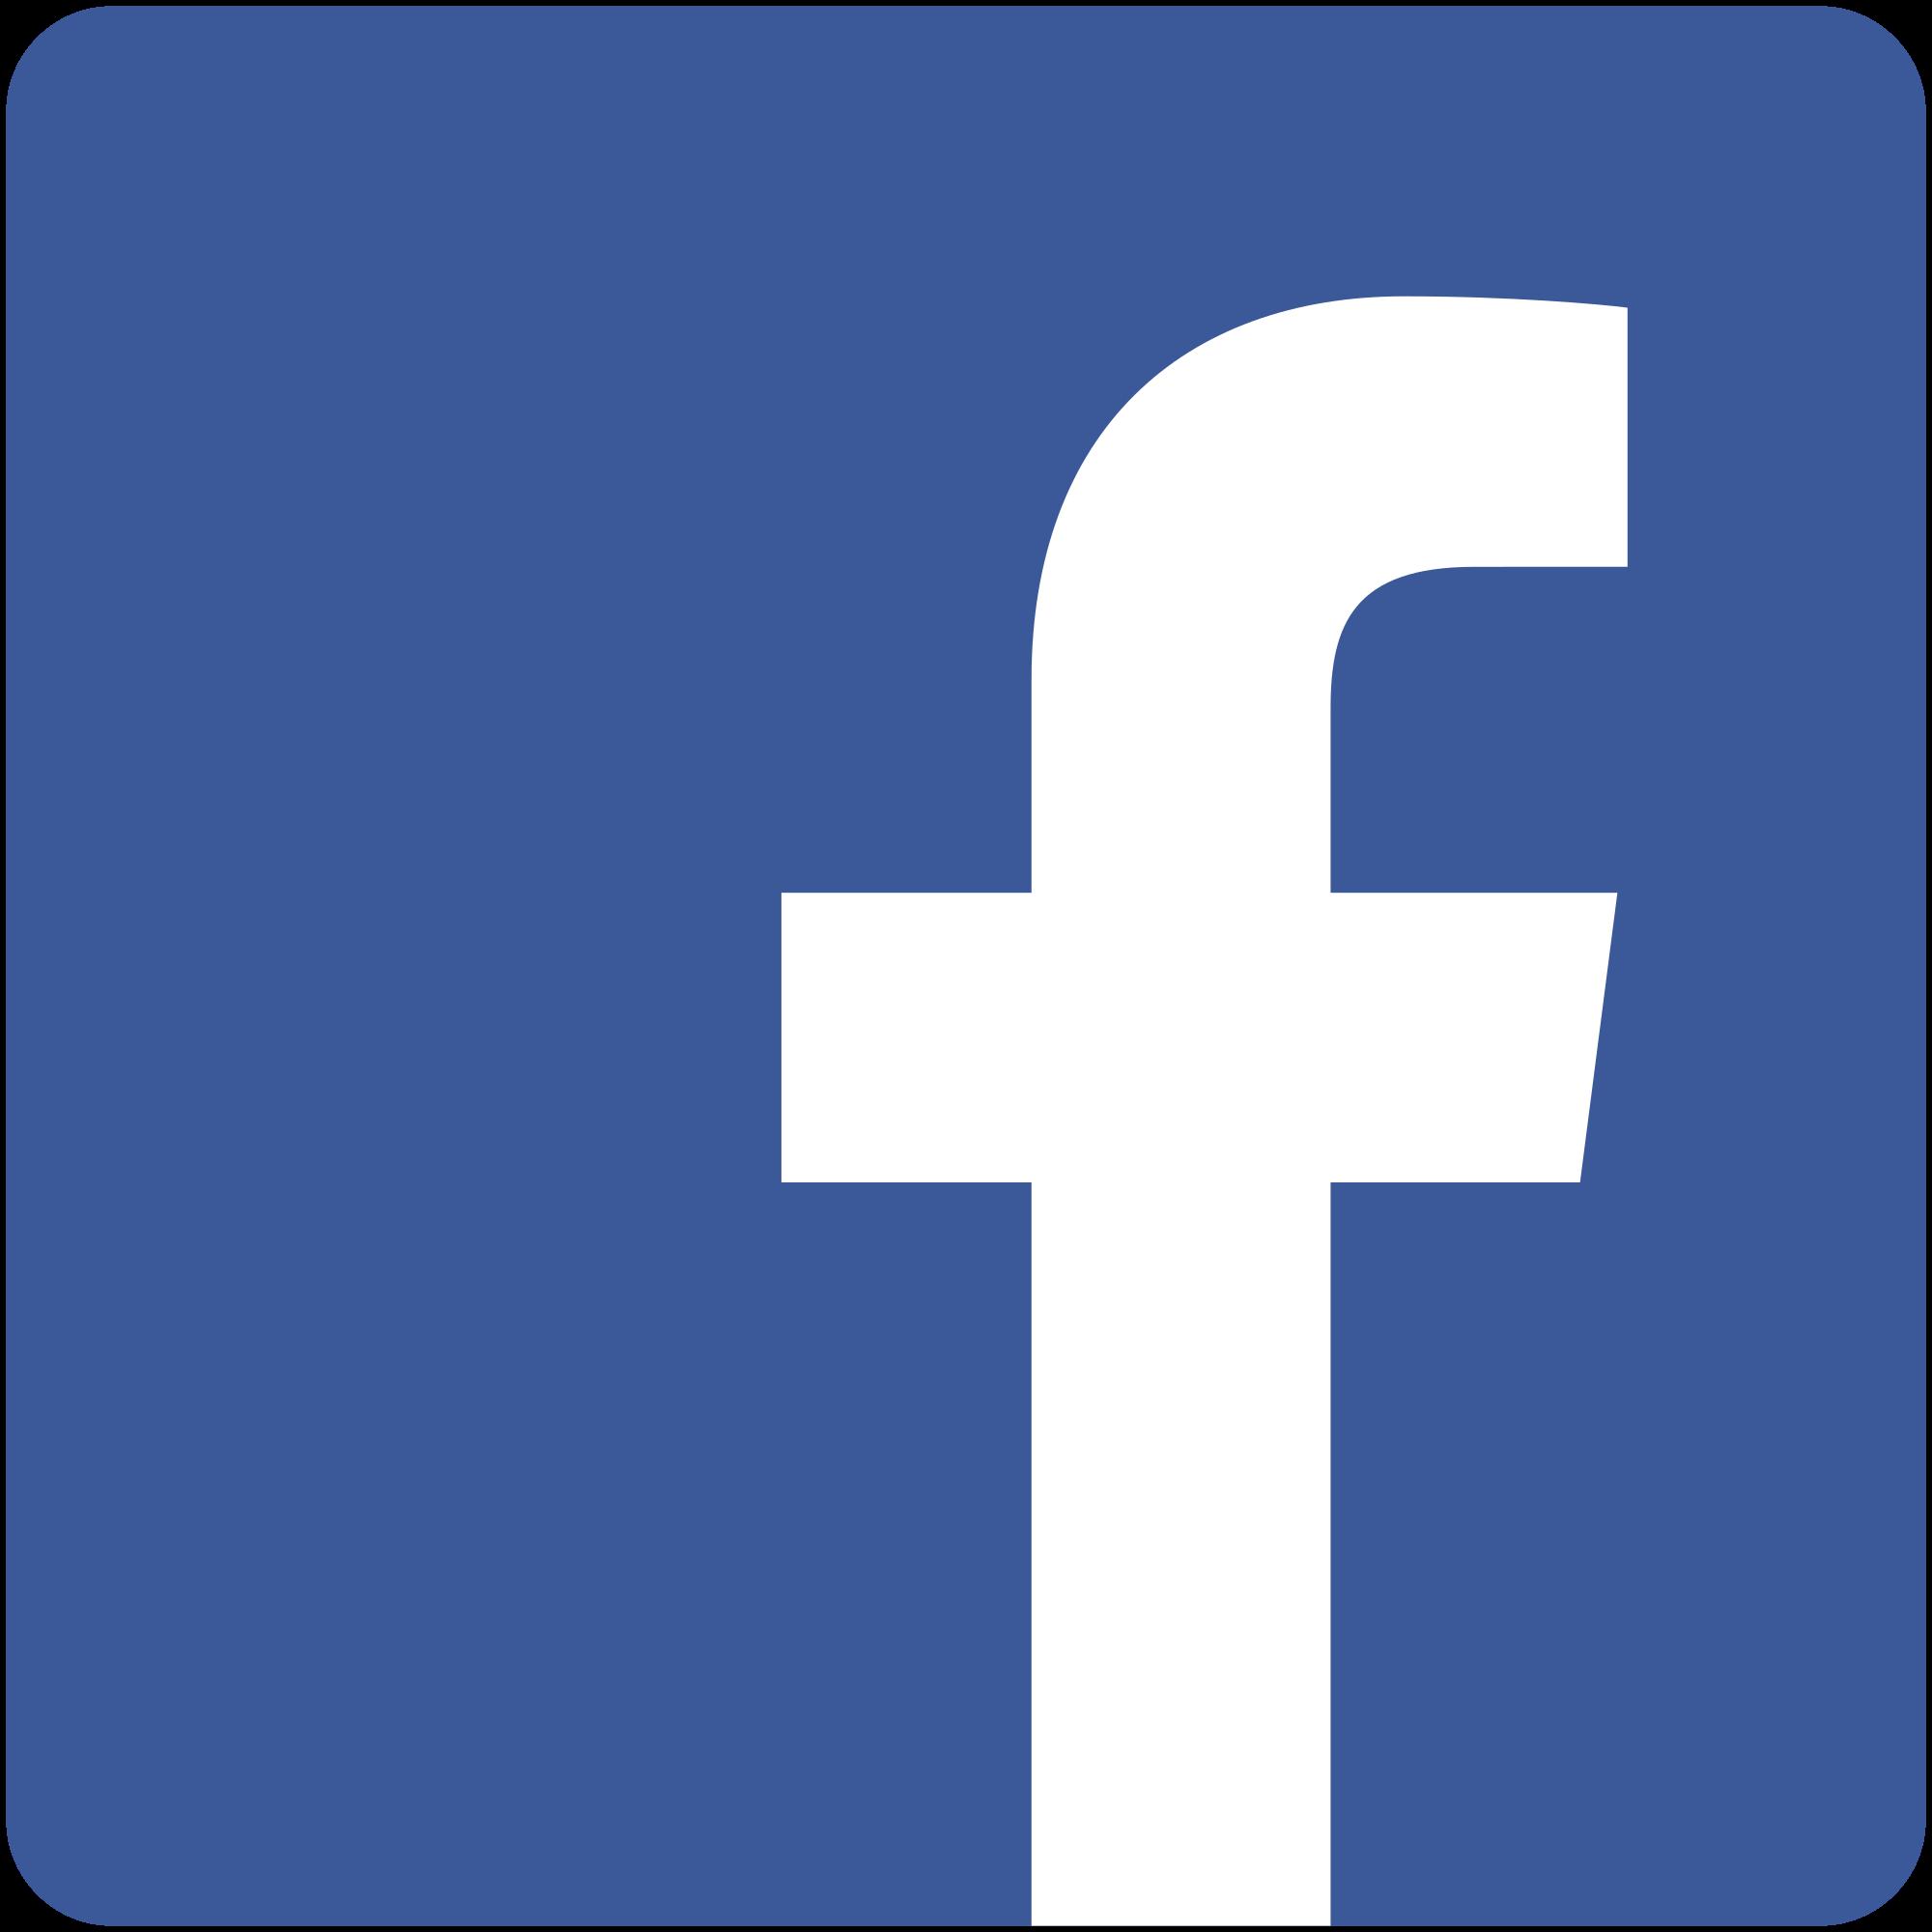 My Web Design Facebook